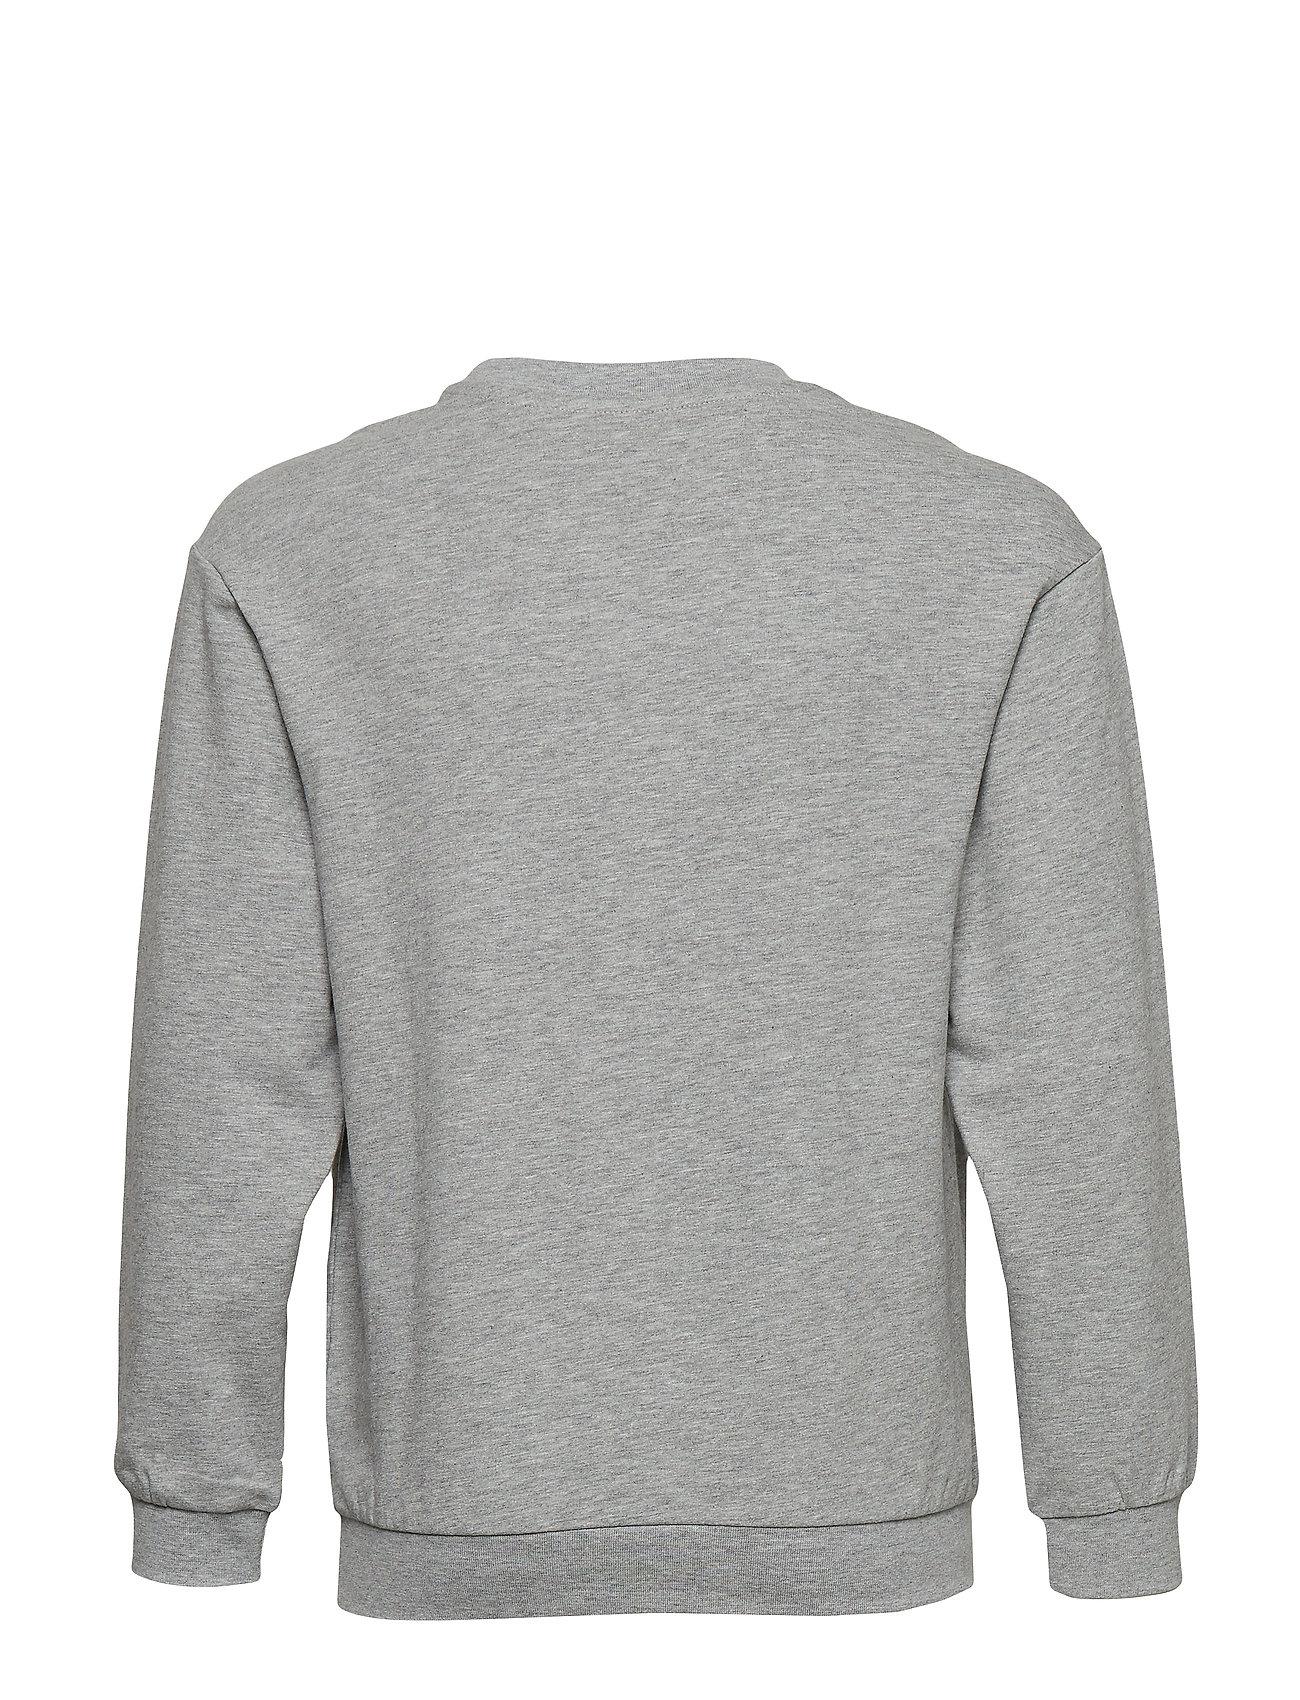 Hummel - HMLDOS SWEATSHIRT - bluzy - grey melange - 1